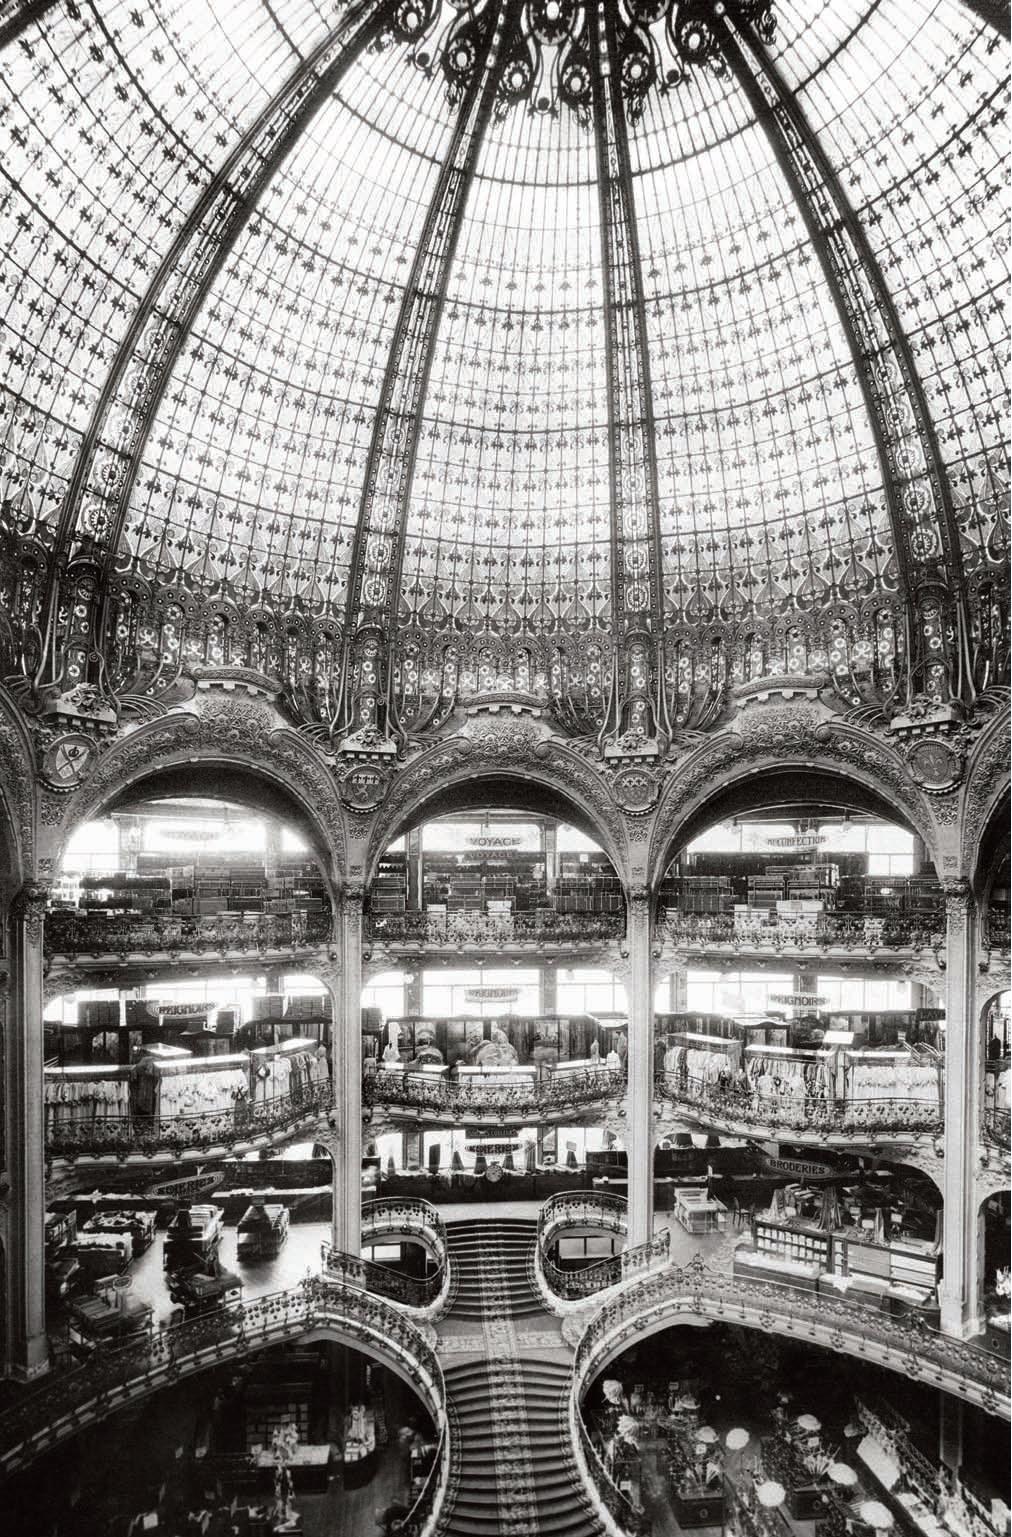 Stulecie Galeries Lafayette